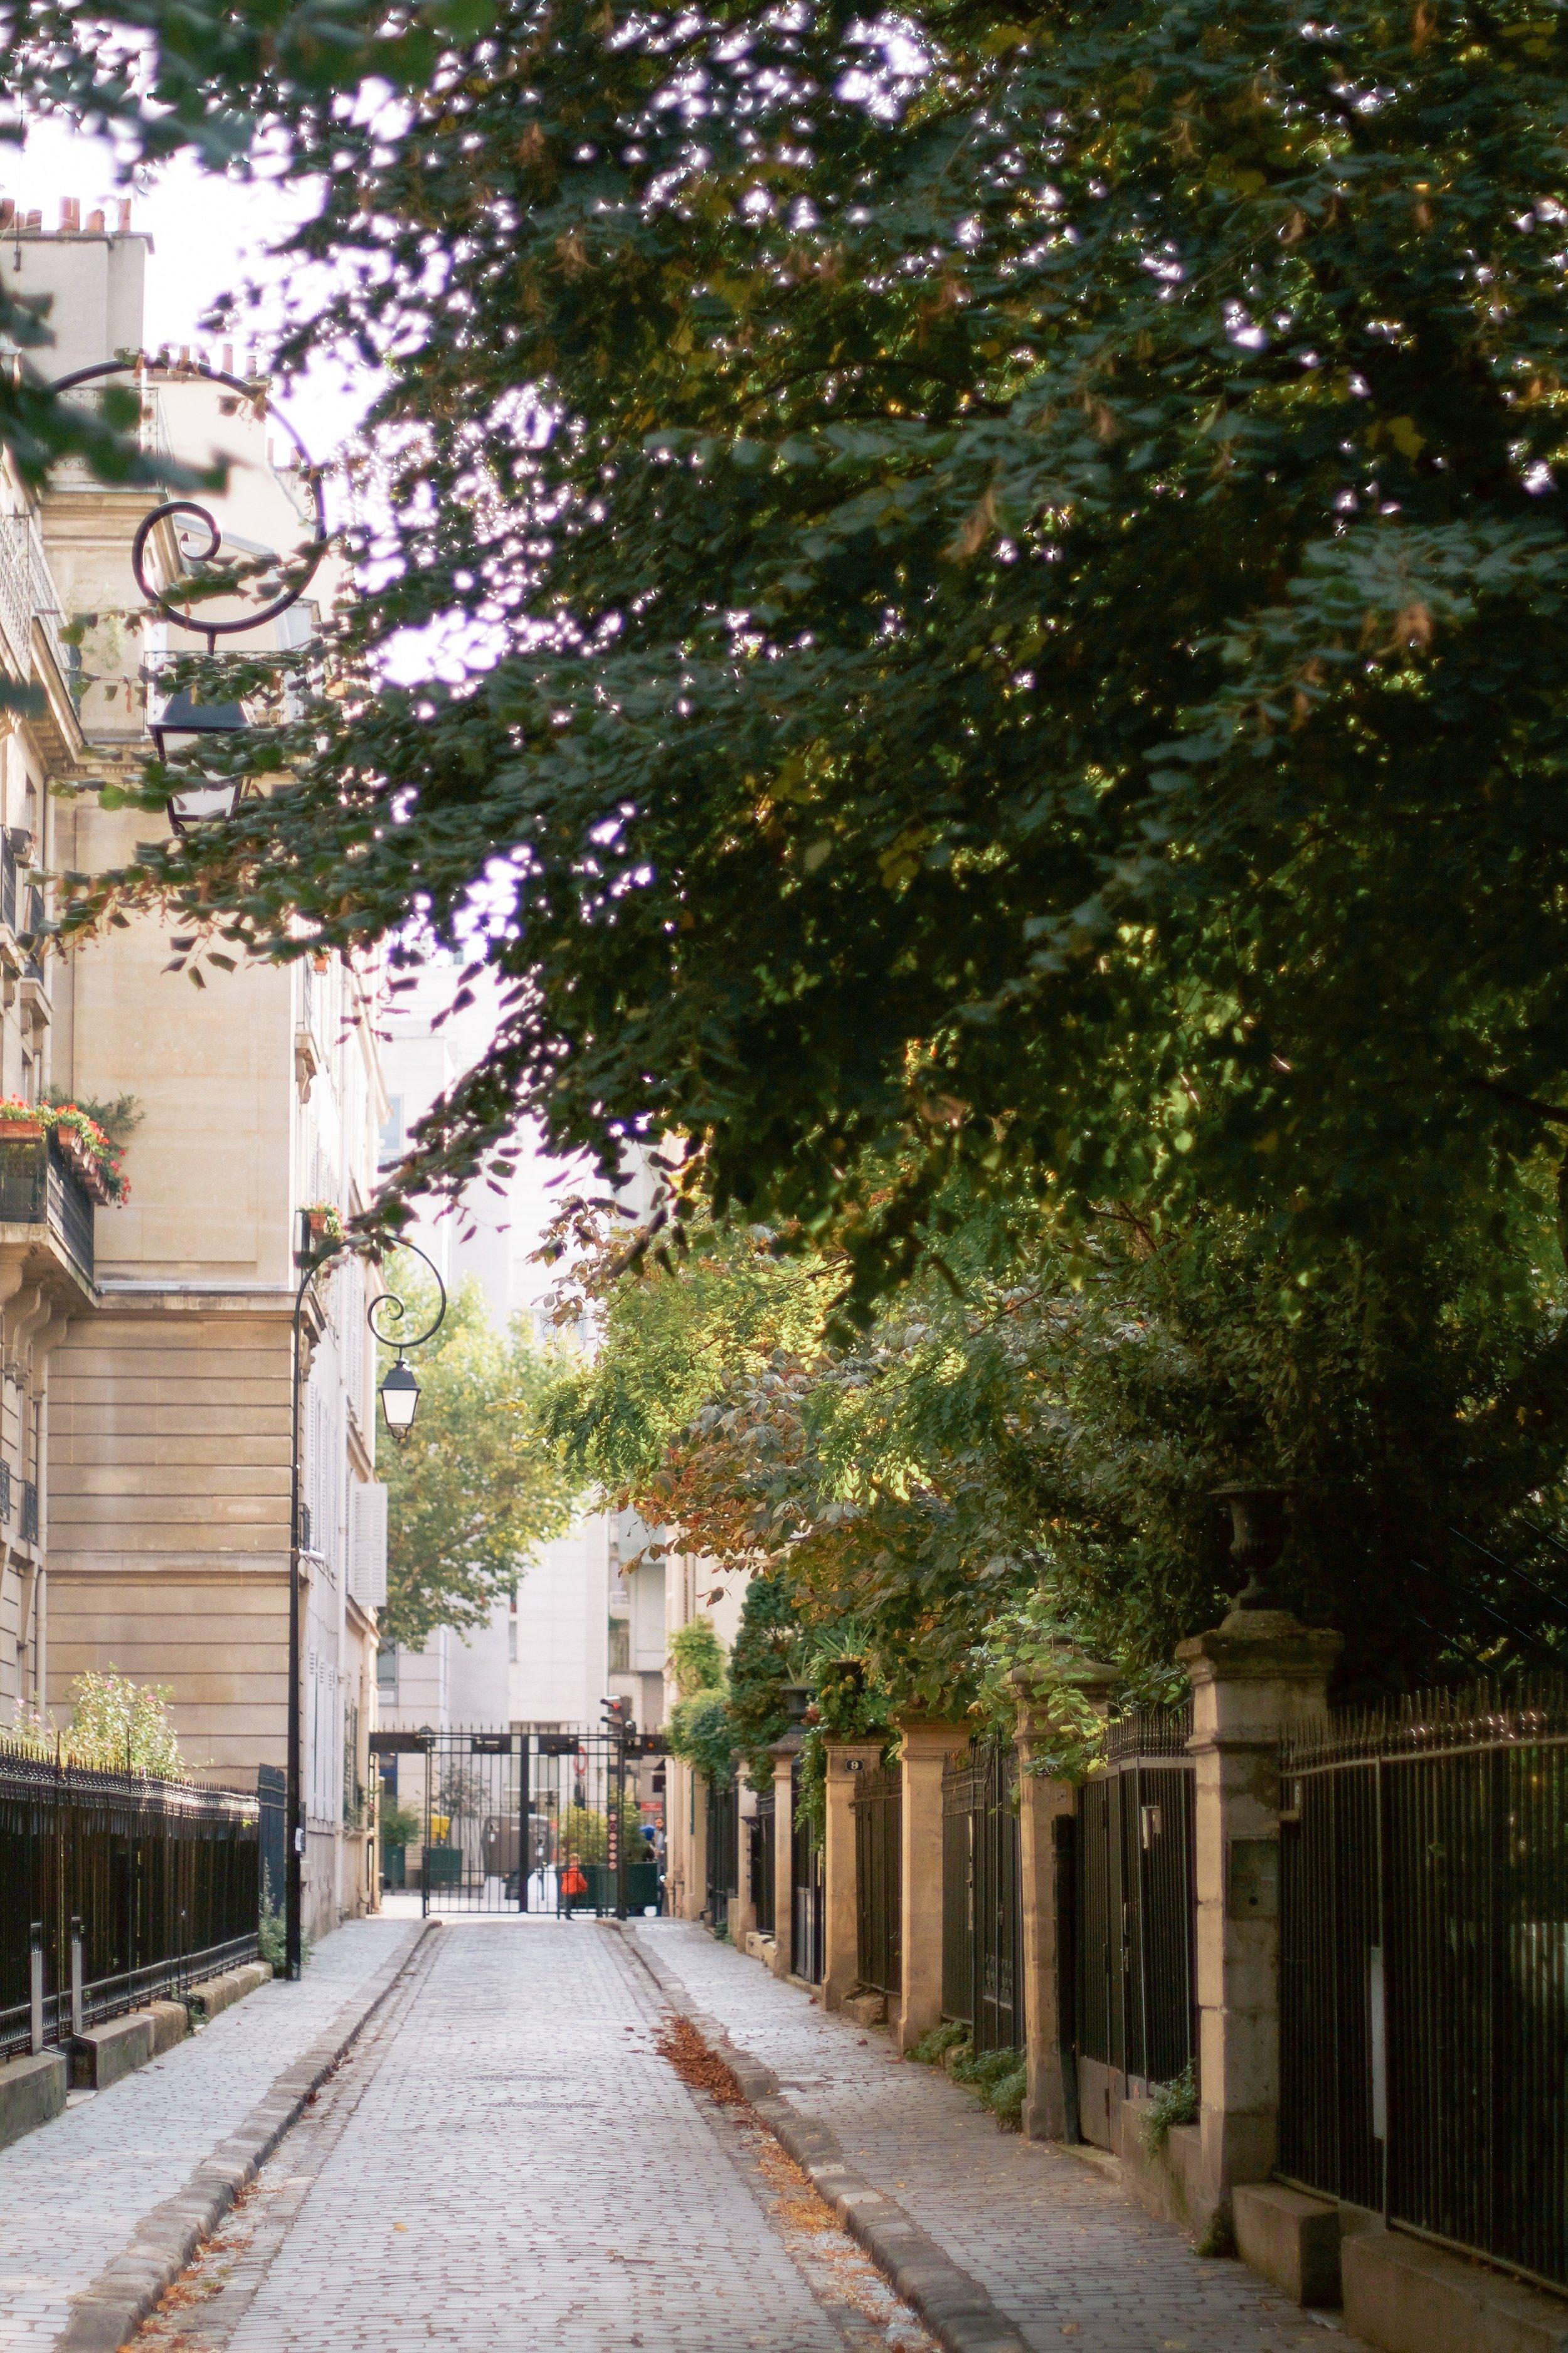 Paris-Walking-Guide-MonicaFrancis-17.jpeg